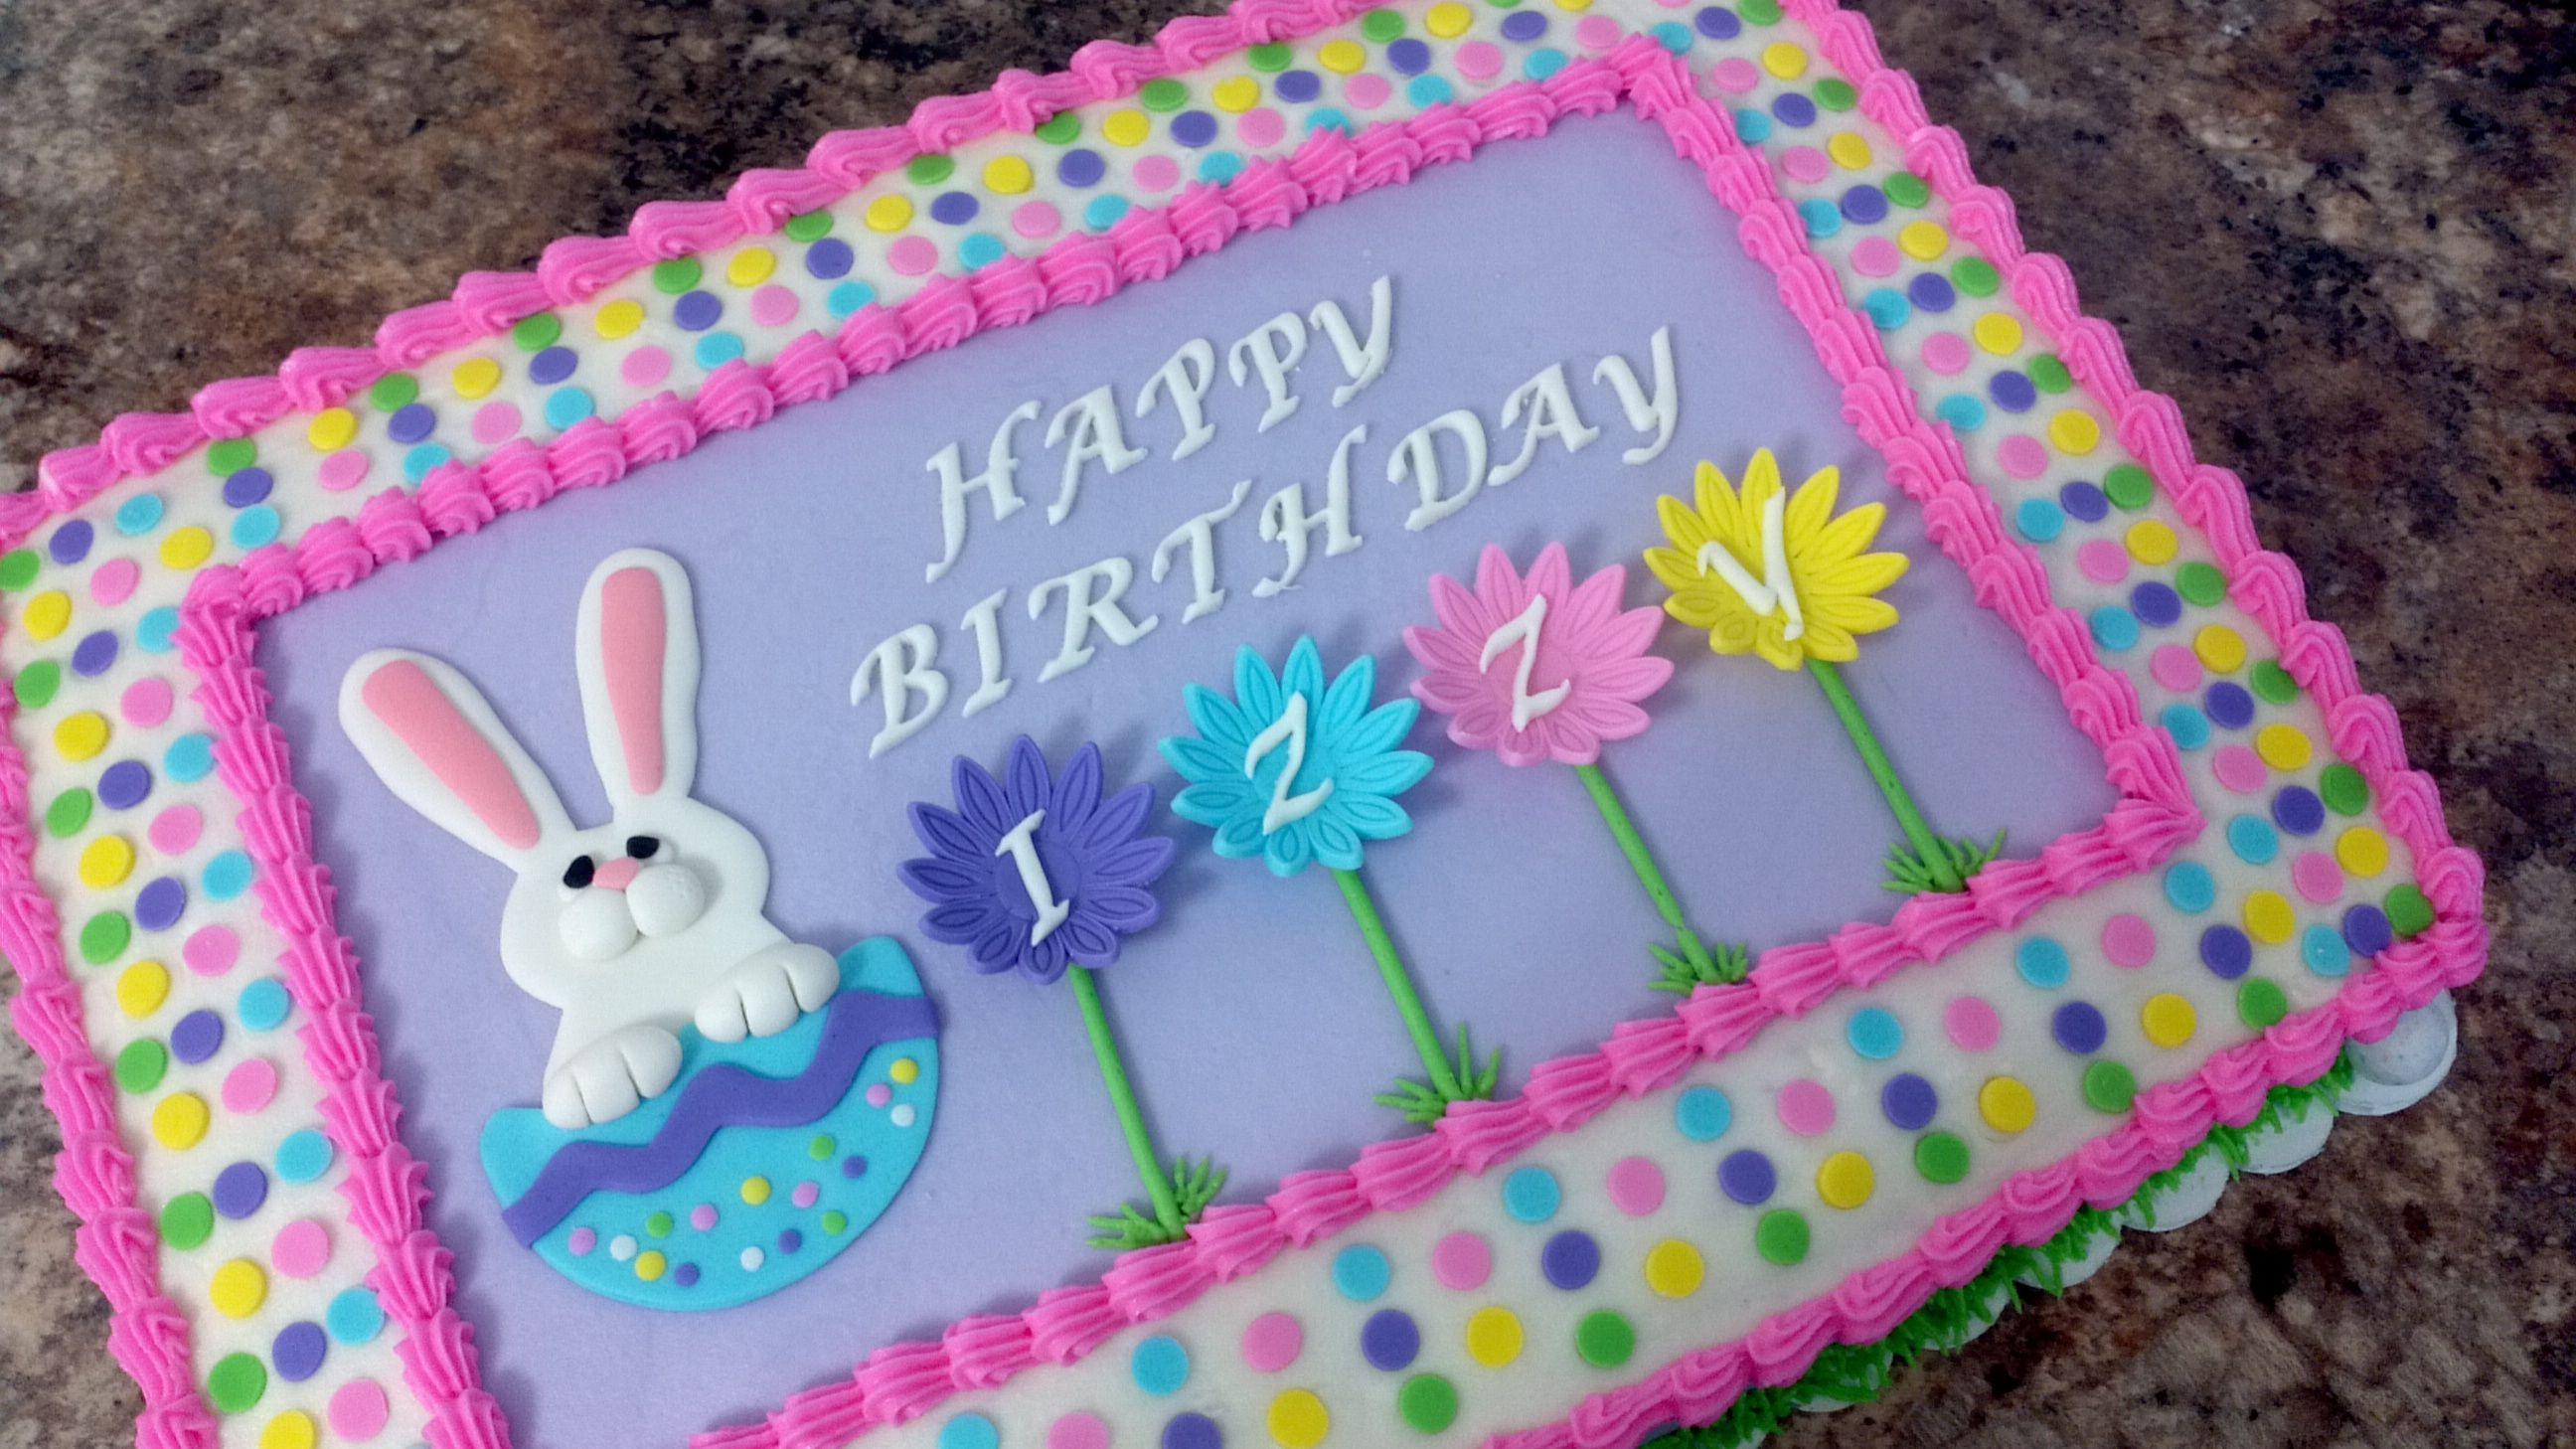 Easter Sheet Cake Ideas  Easter theme birthday cake 1 4 sheet covered in